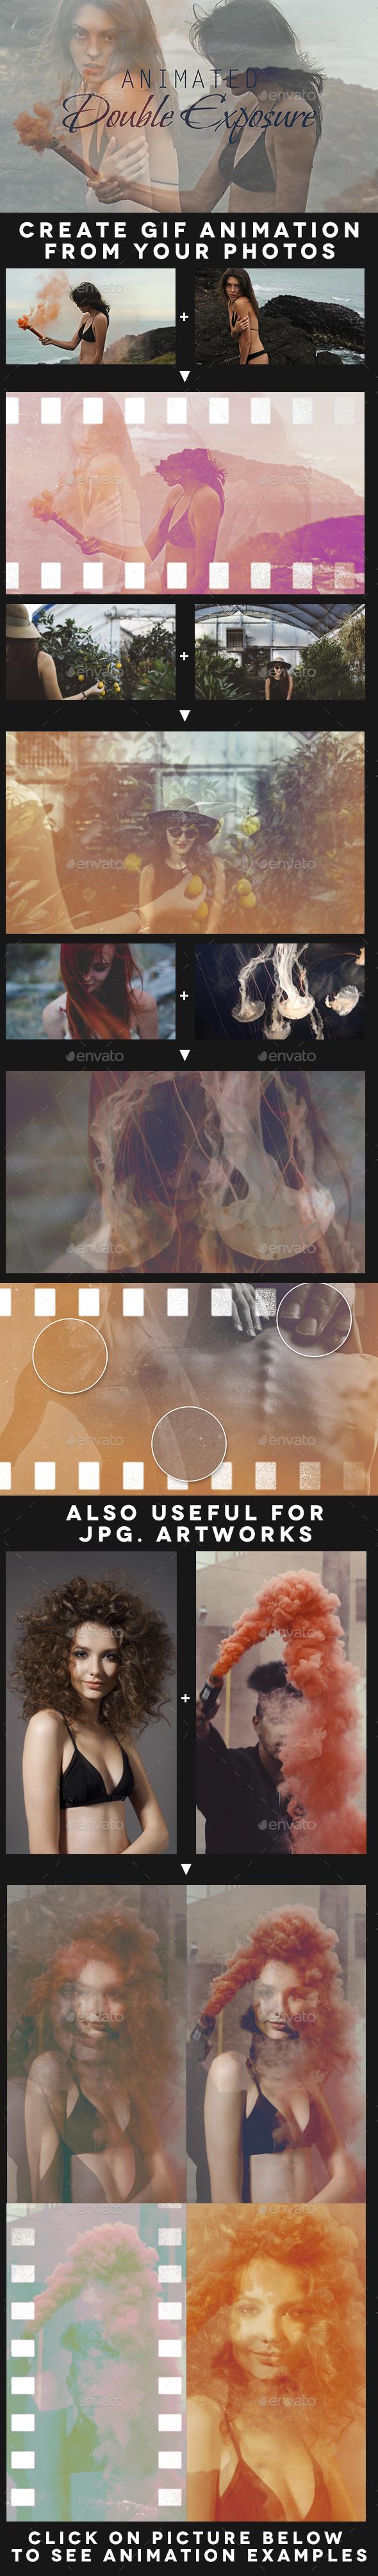 Animated Double Exposure Kit - Artistic Photo Templates